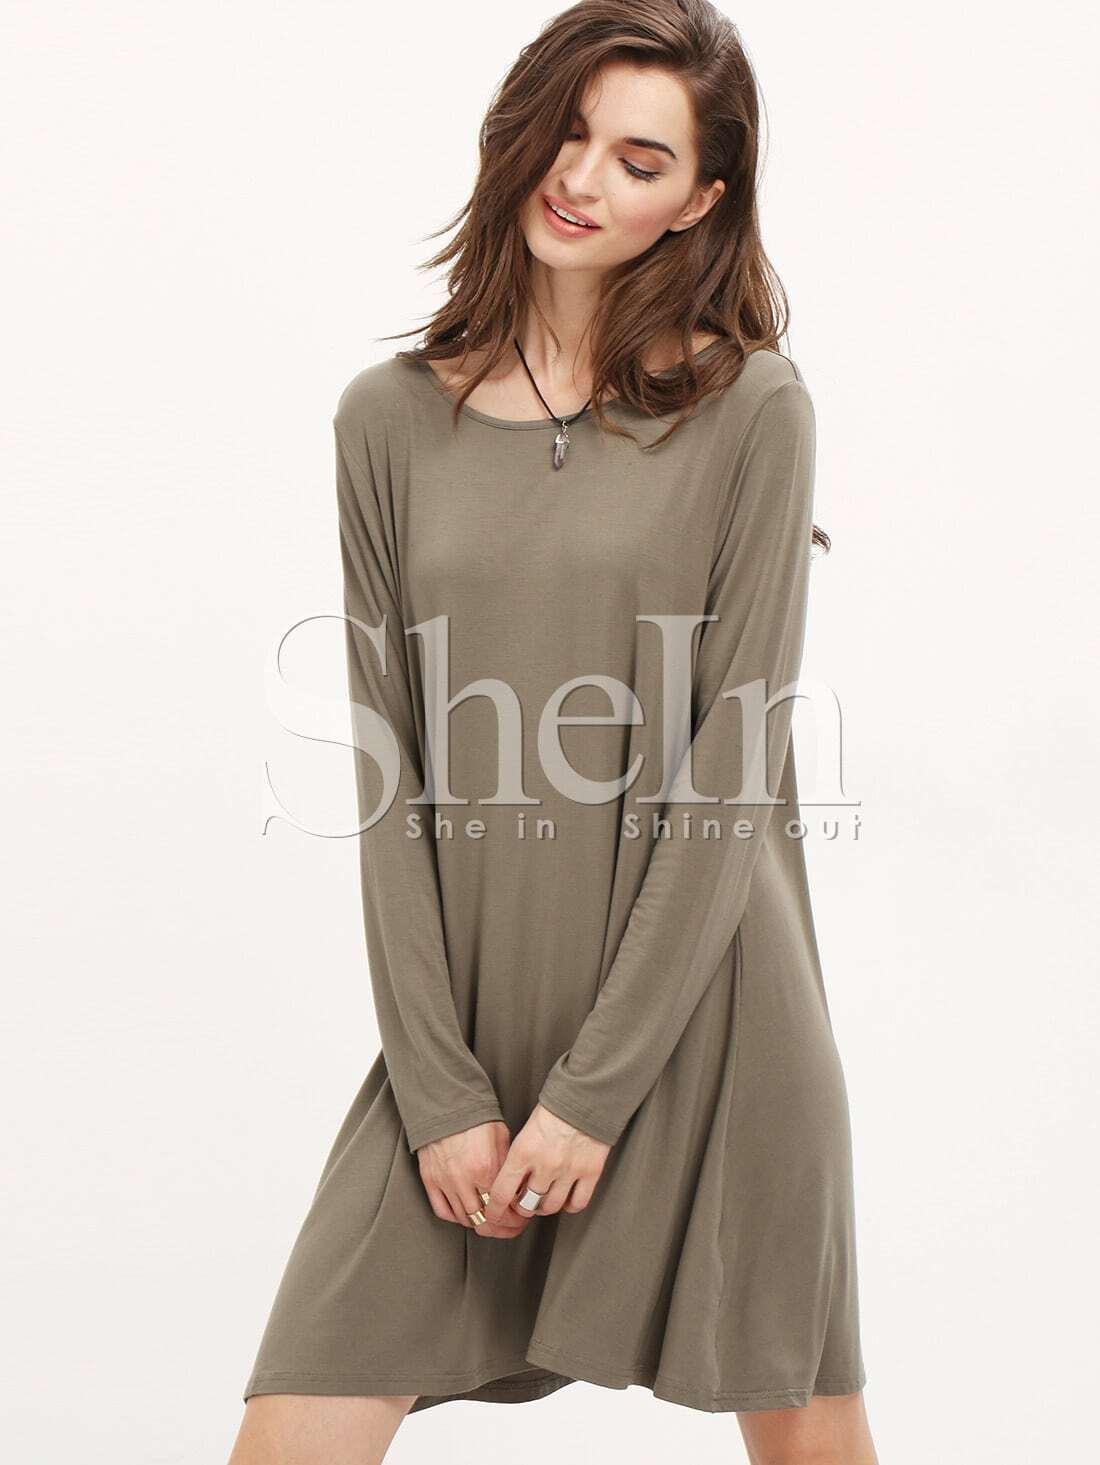 Grey Long Sleeve Casual DressGrey Long Sleeve Casual Dress<br><br>color: Grey<br>size: M,S,XL,XS,XXL